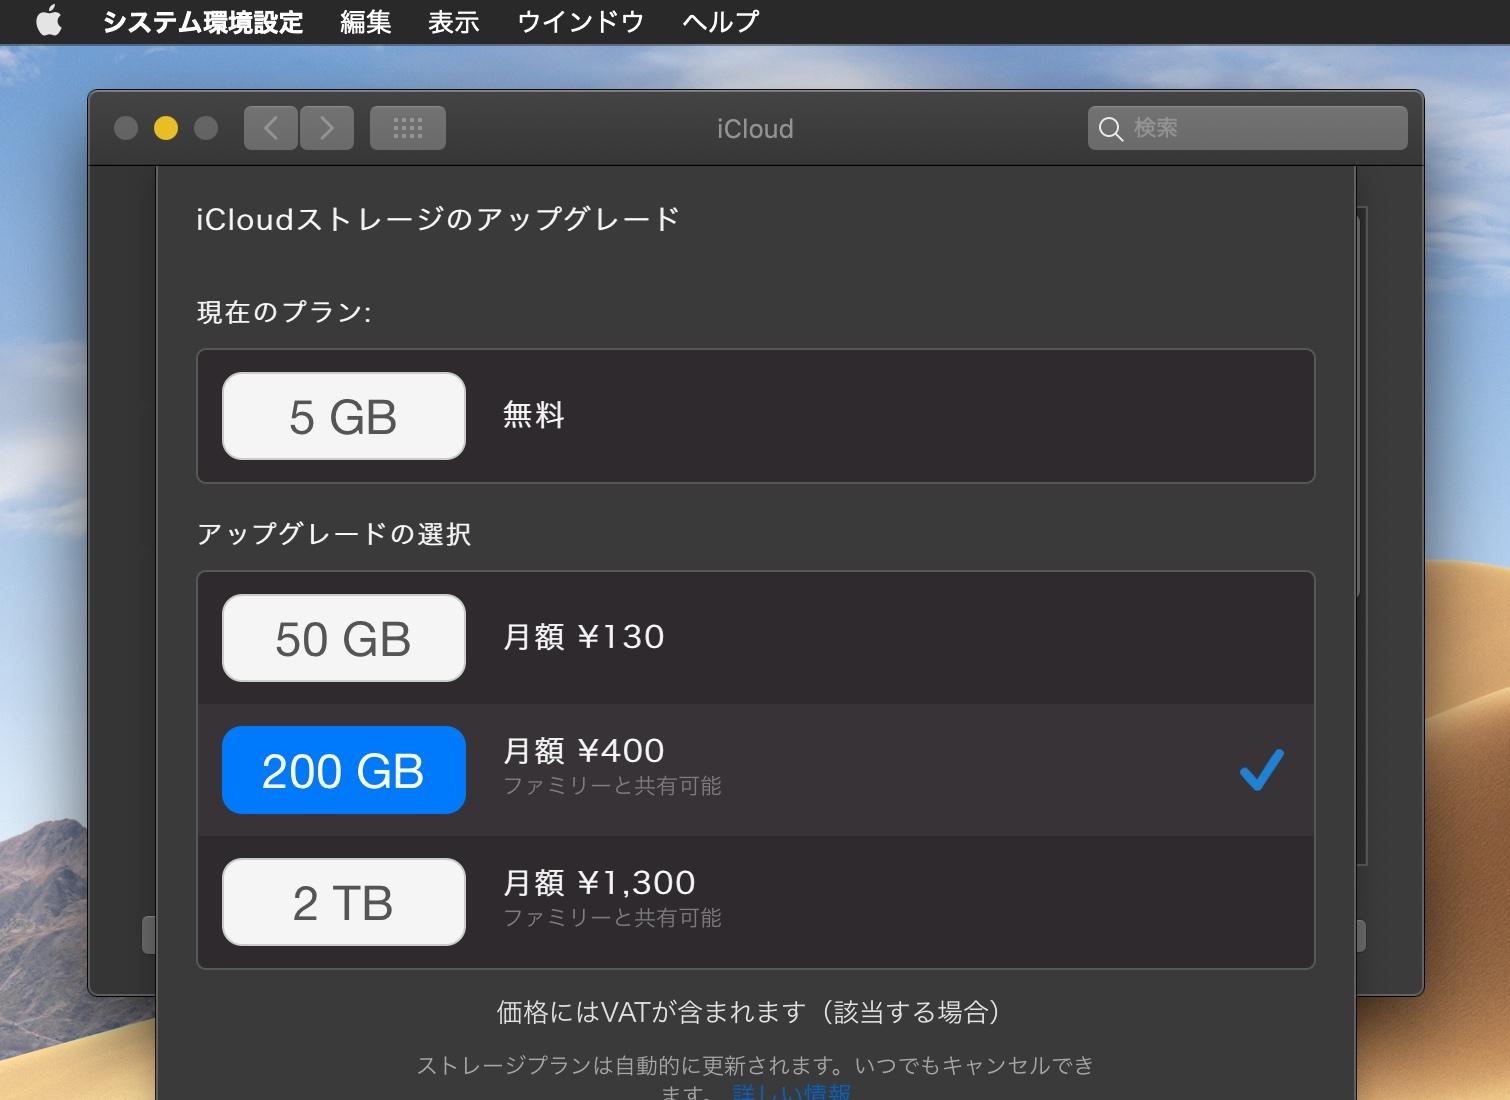 iCloud のストレージプランと料金